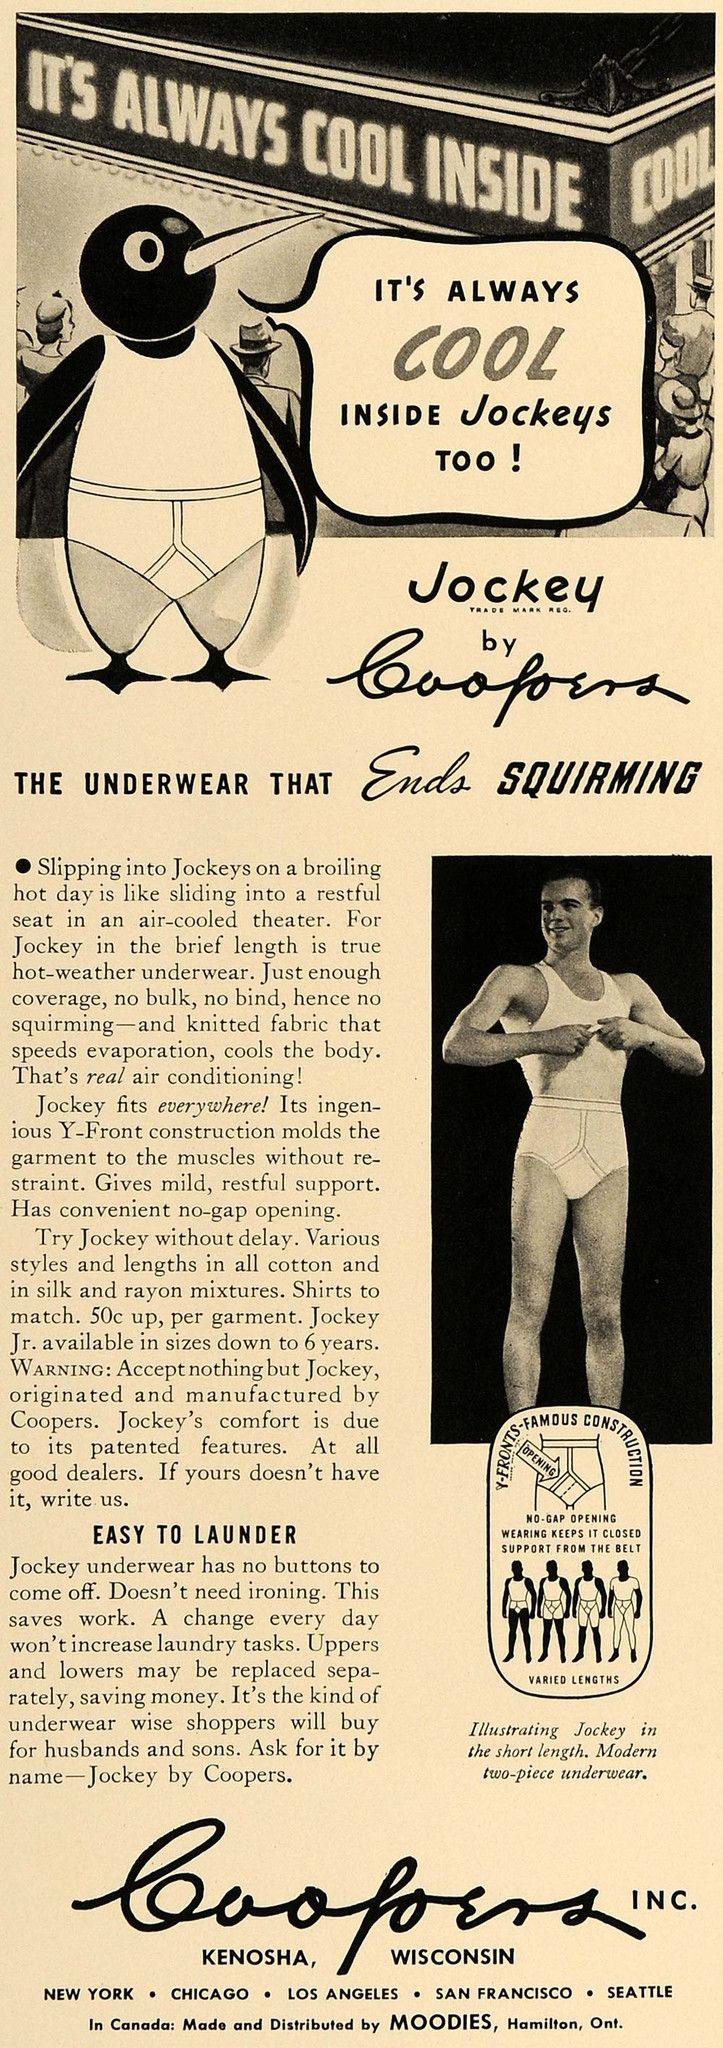 1938 Ad Coopers Inc. Jockey Men Underwear Clothing - ORIGINAL ADVERTISING ESQ1